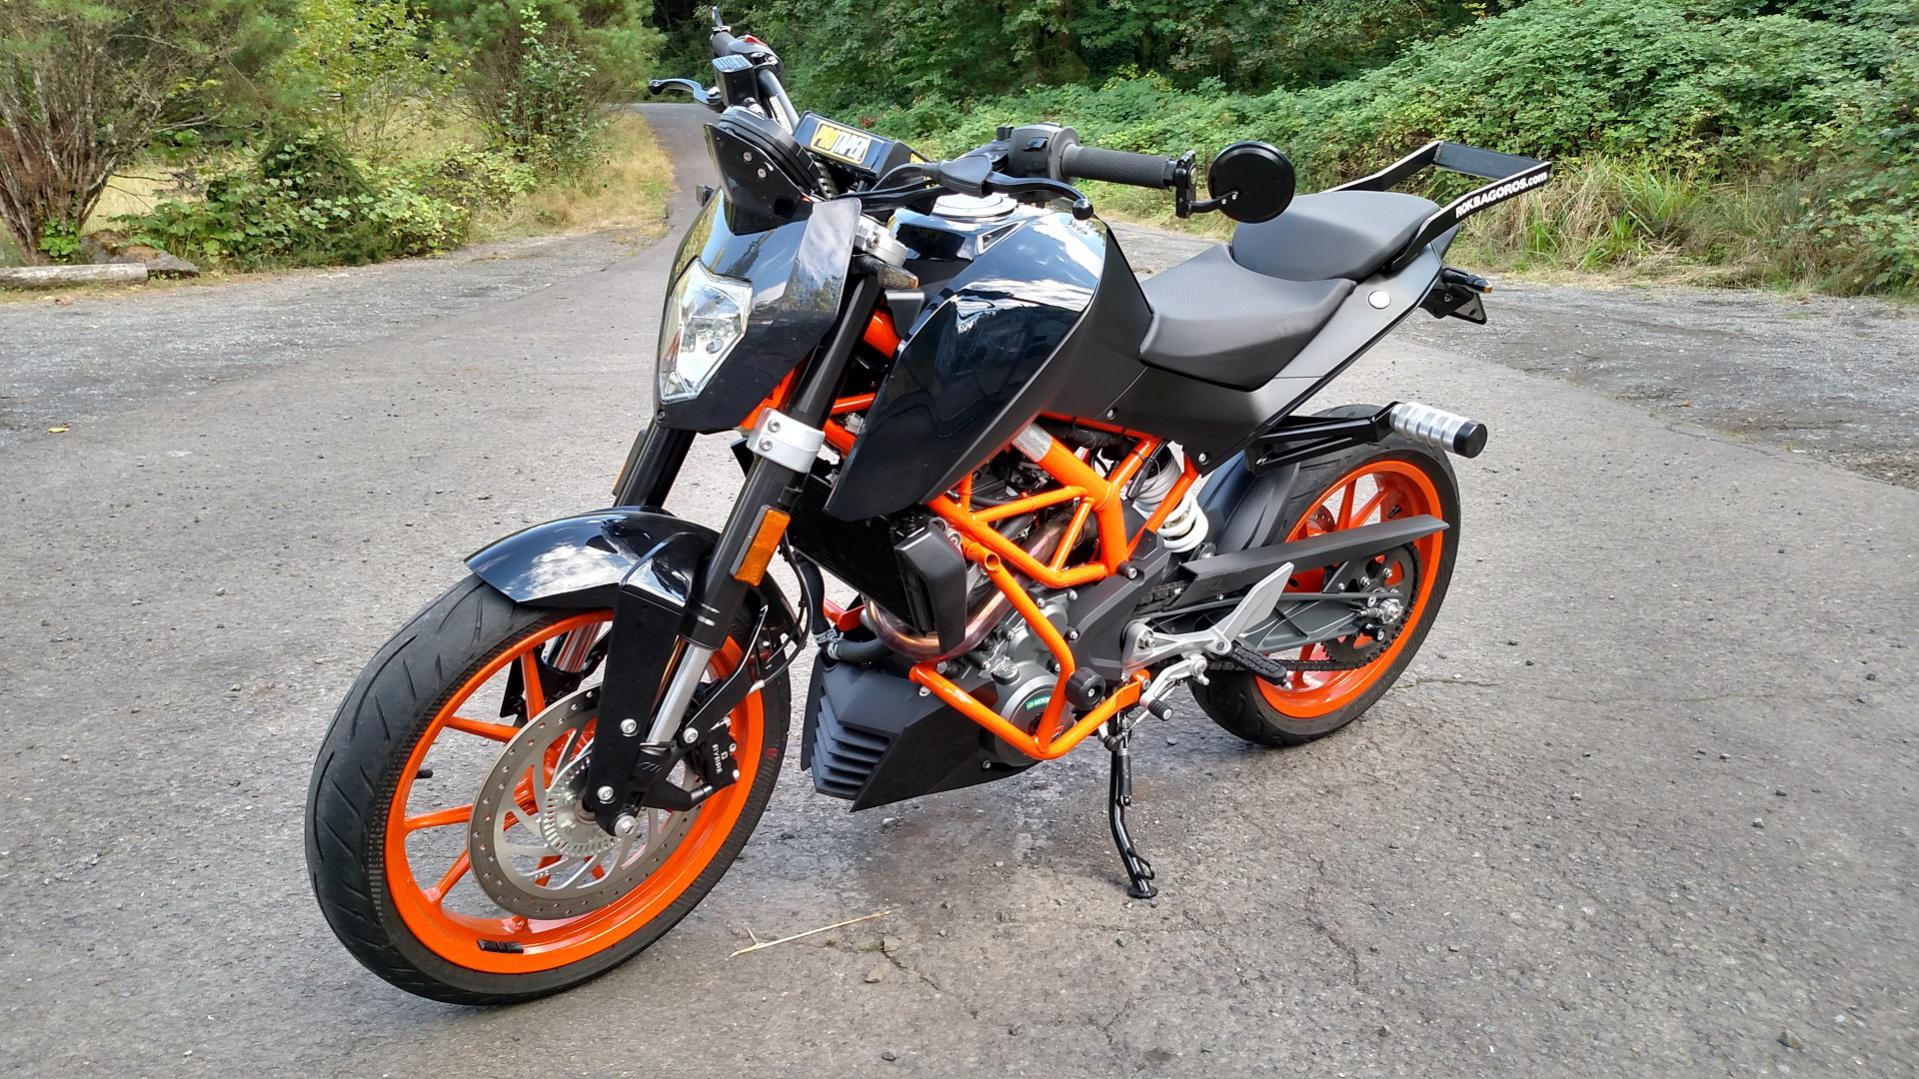 my 390 is starting to look like a stunt bike - ktm duke 390 forum